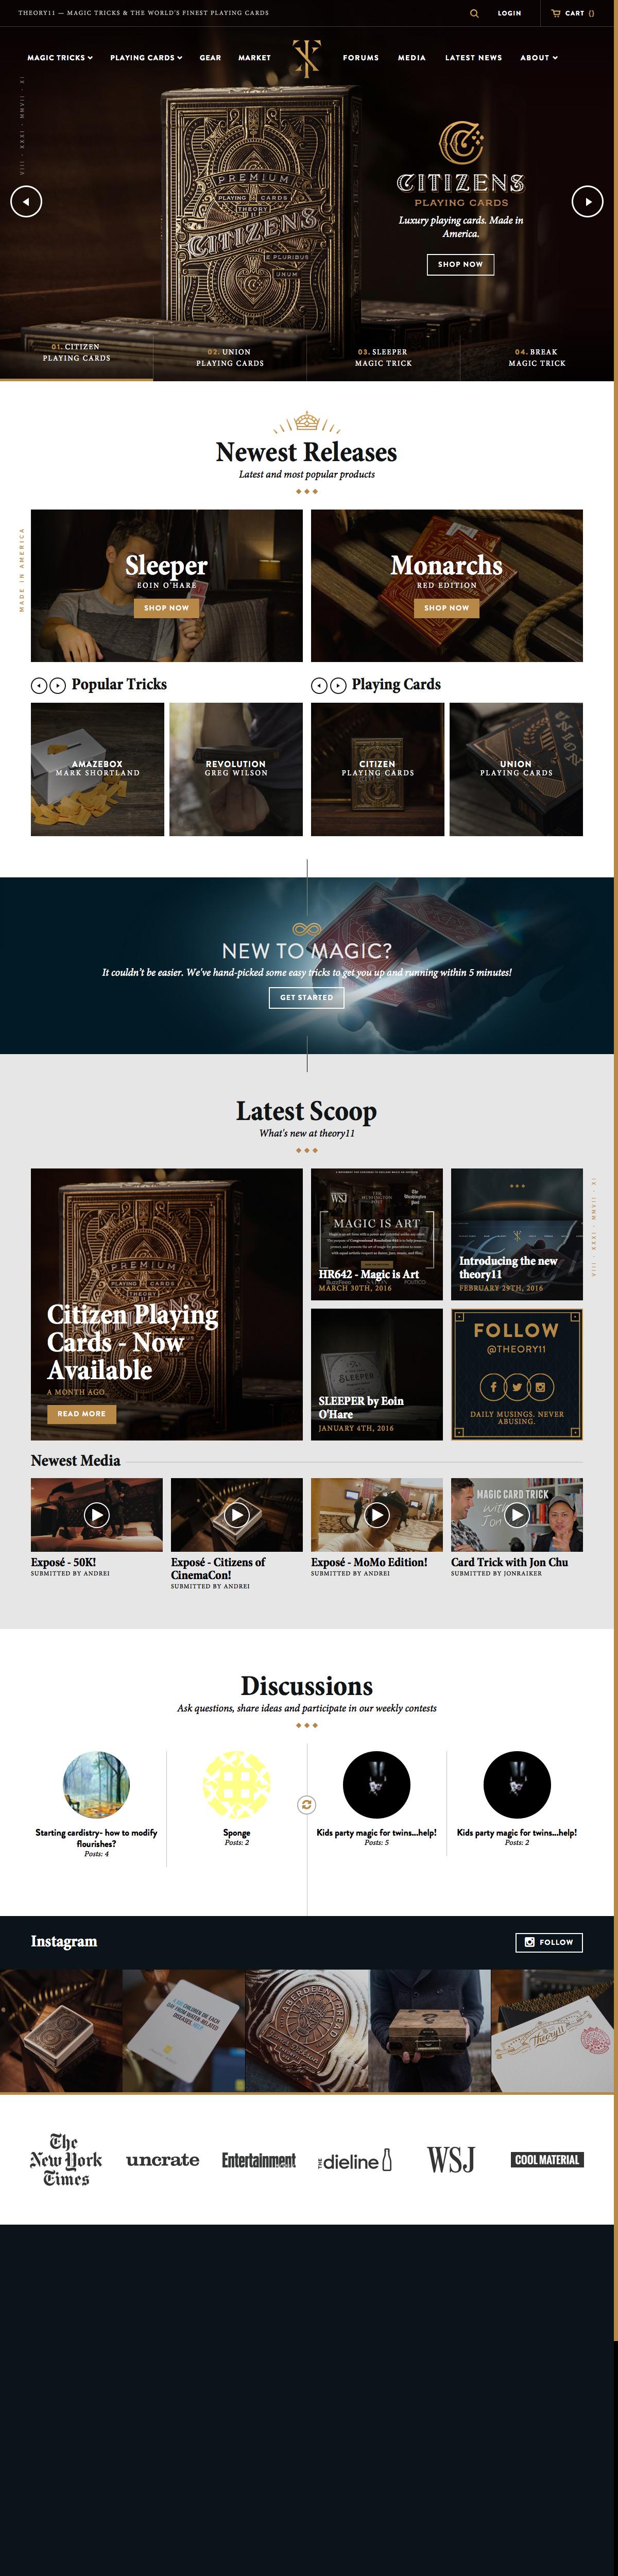 eCommerce website: Theory11